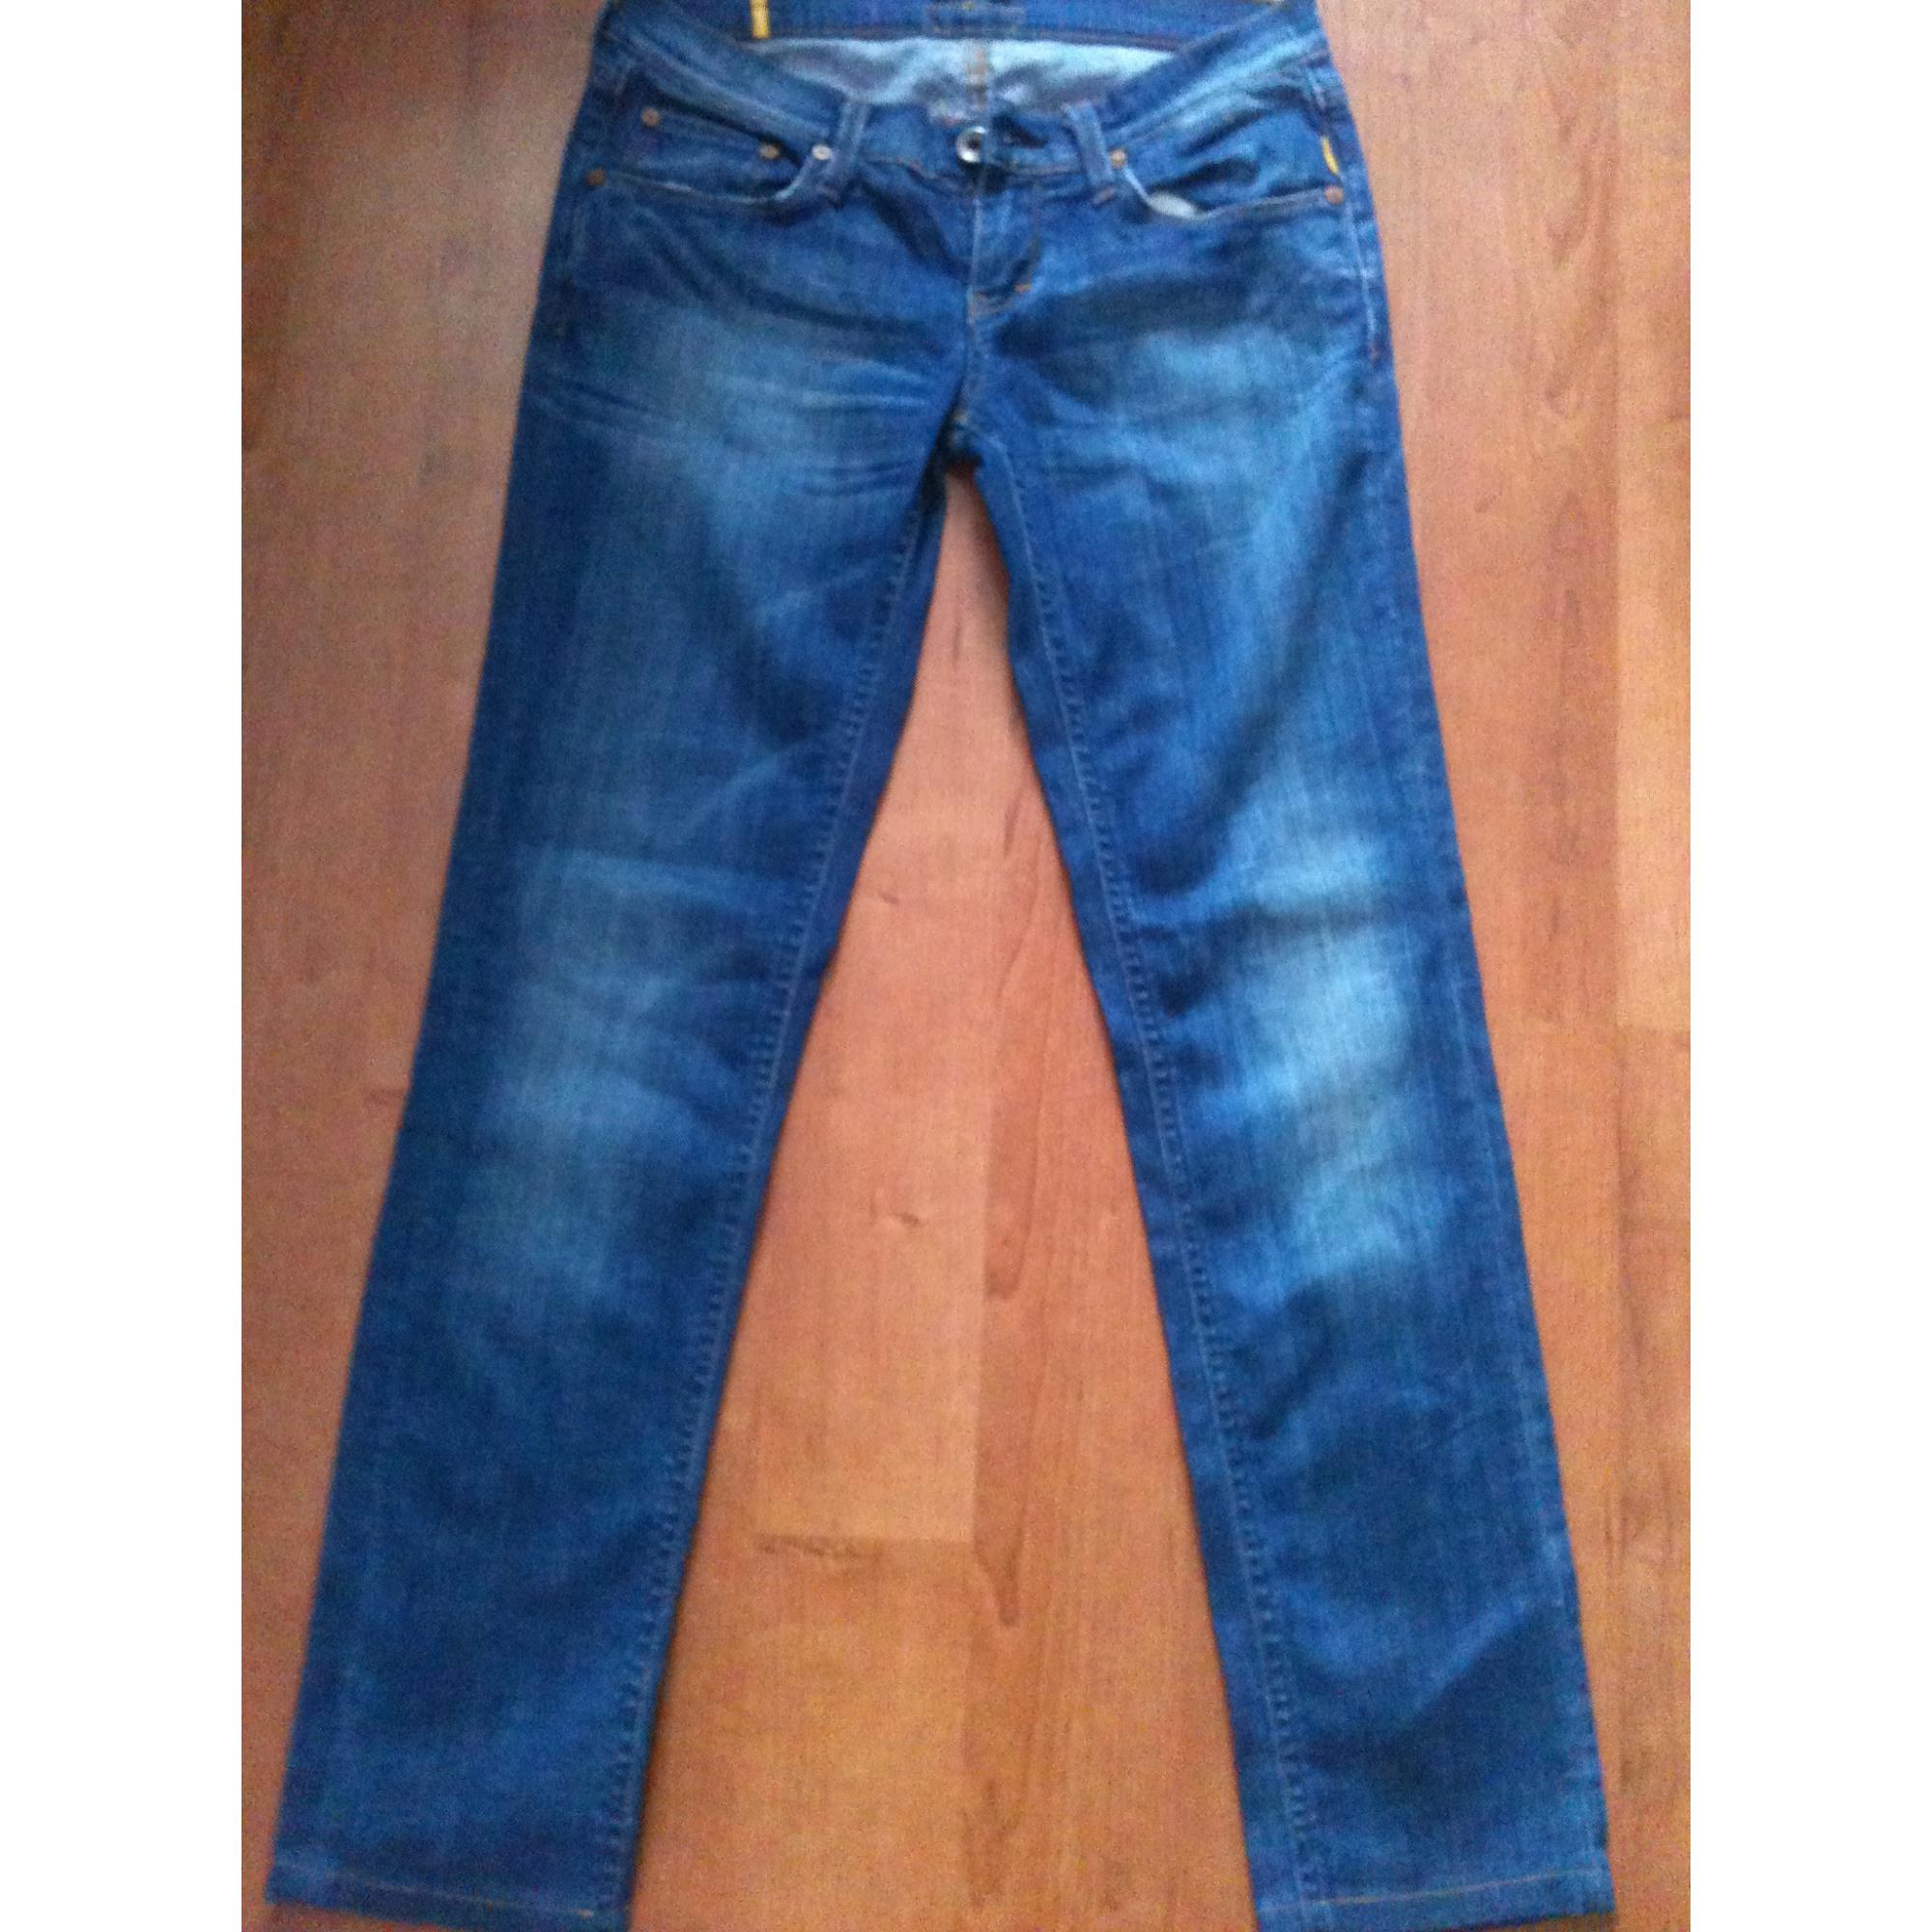 Jeans droit MELTIN' POT Bleu, bleu marine, bleu turquoise